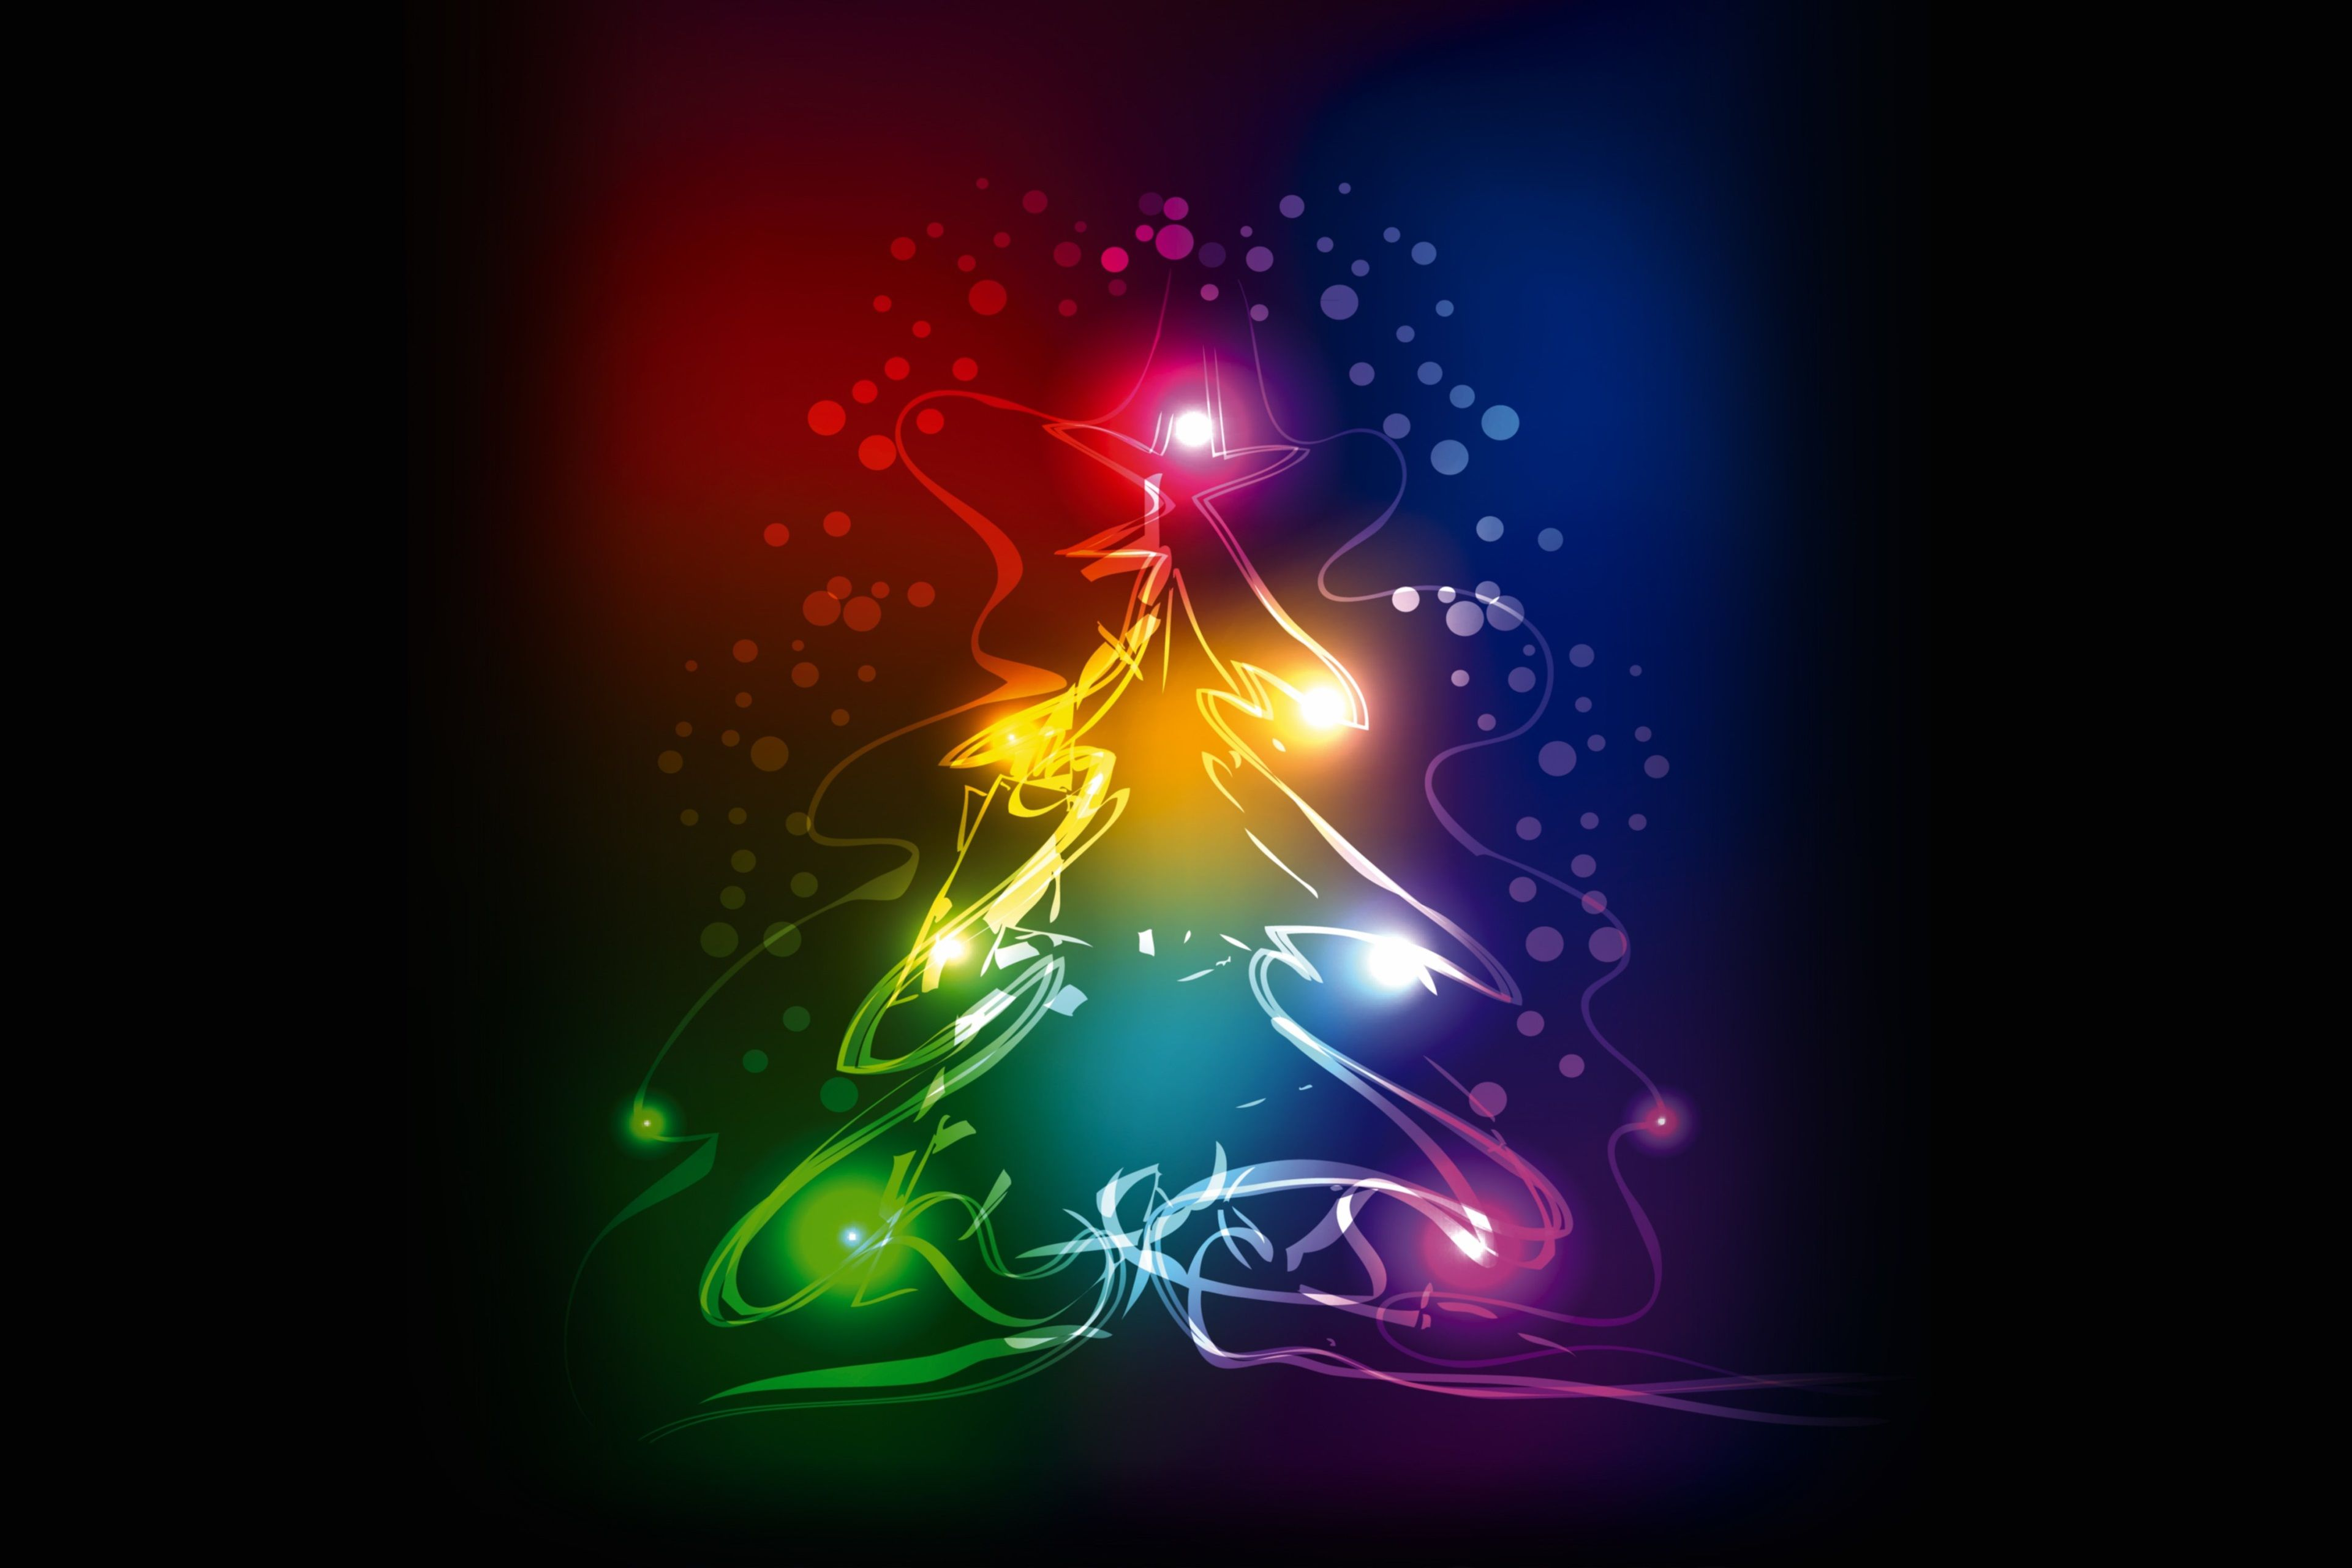 3840x2560 Christmas Tree 4k Pc Wallpaper Download Hd Christmas Wallpaper Backgrounds Free Christmas Wallpaper Downloads Christmas Phone Wallpaper